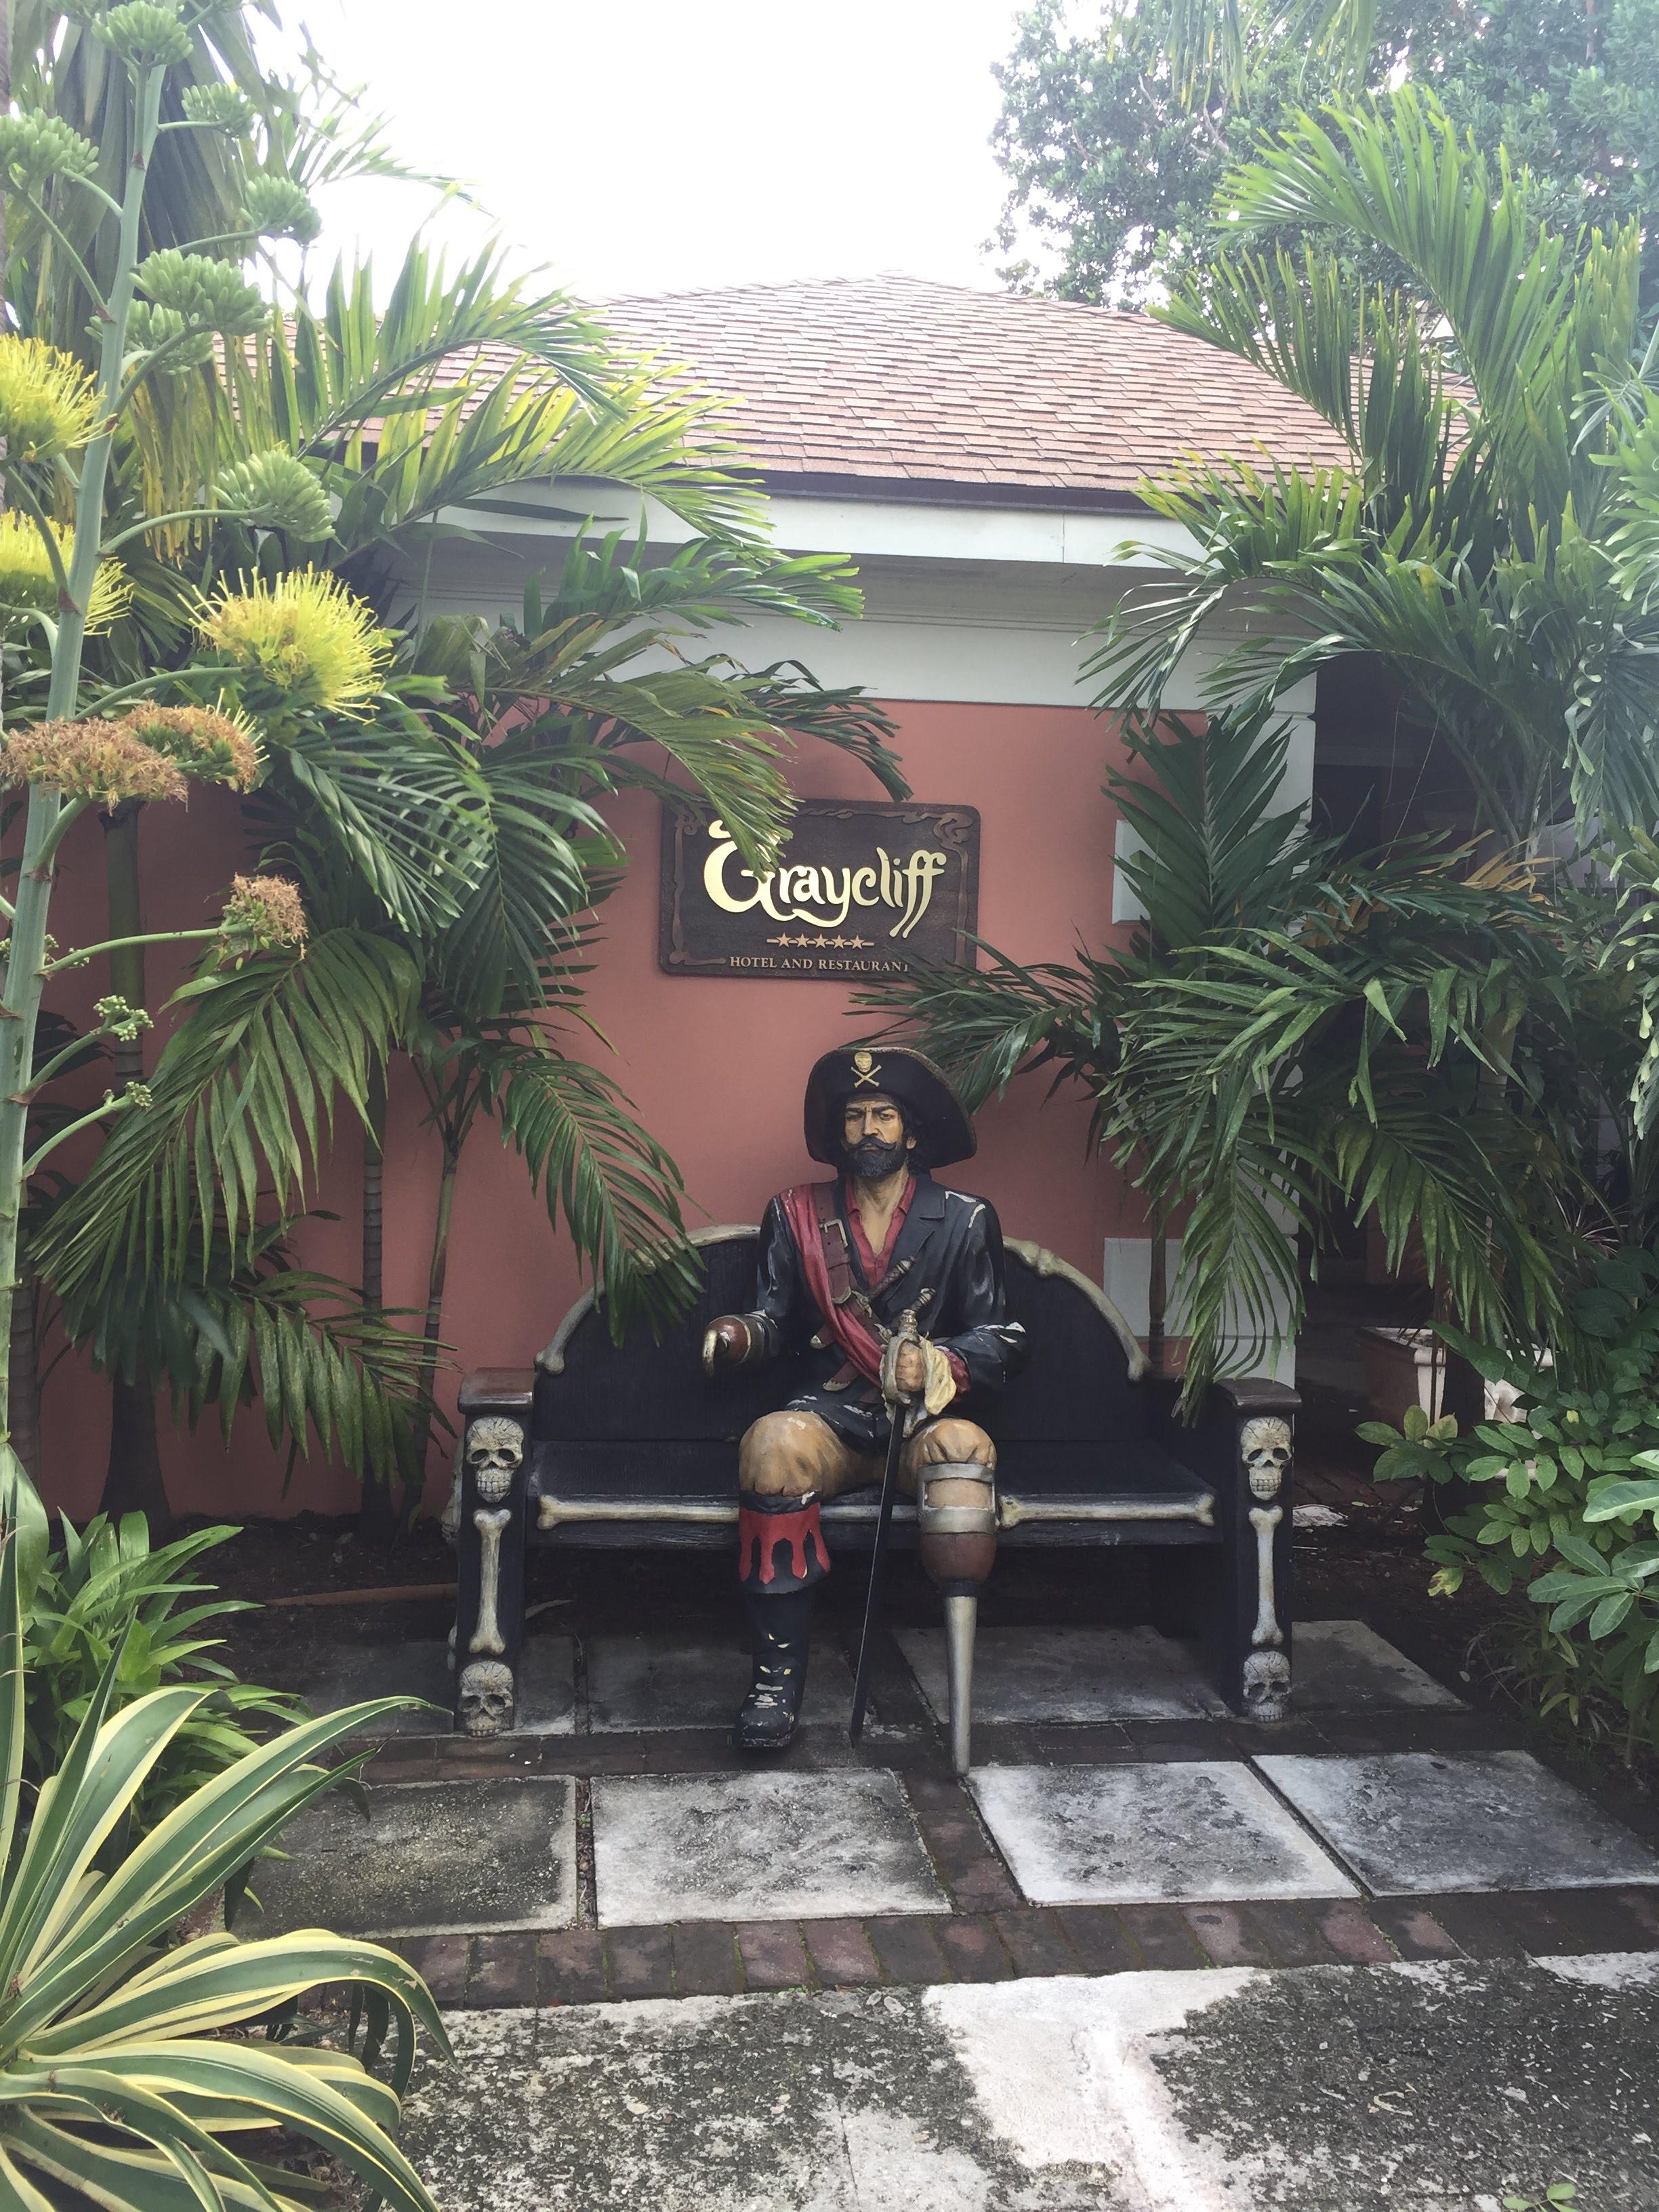 Graycliff in the Bahamas